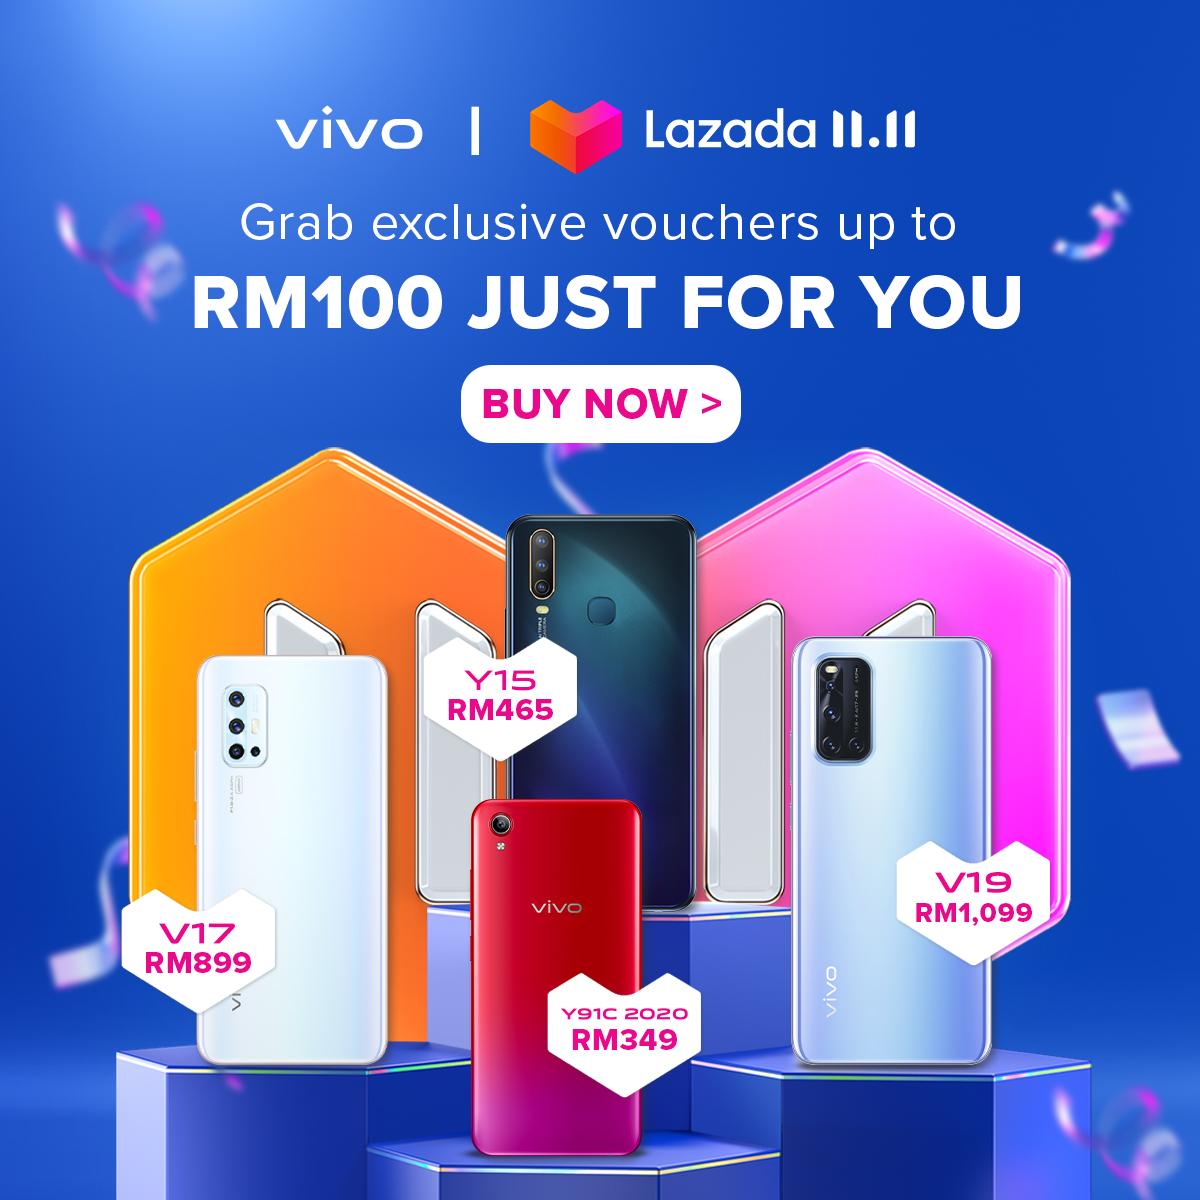 vivo Malaysia 11.11 Sales on Lazada